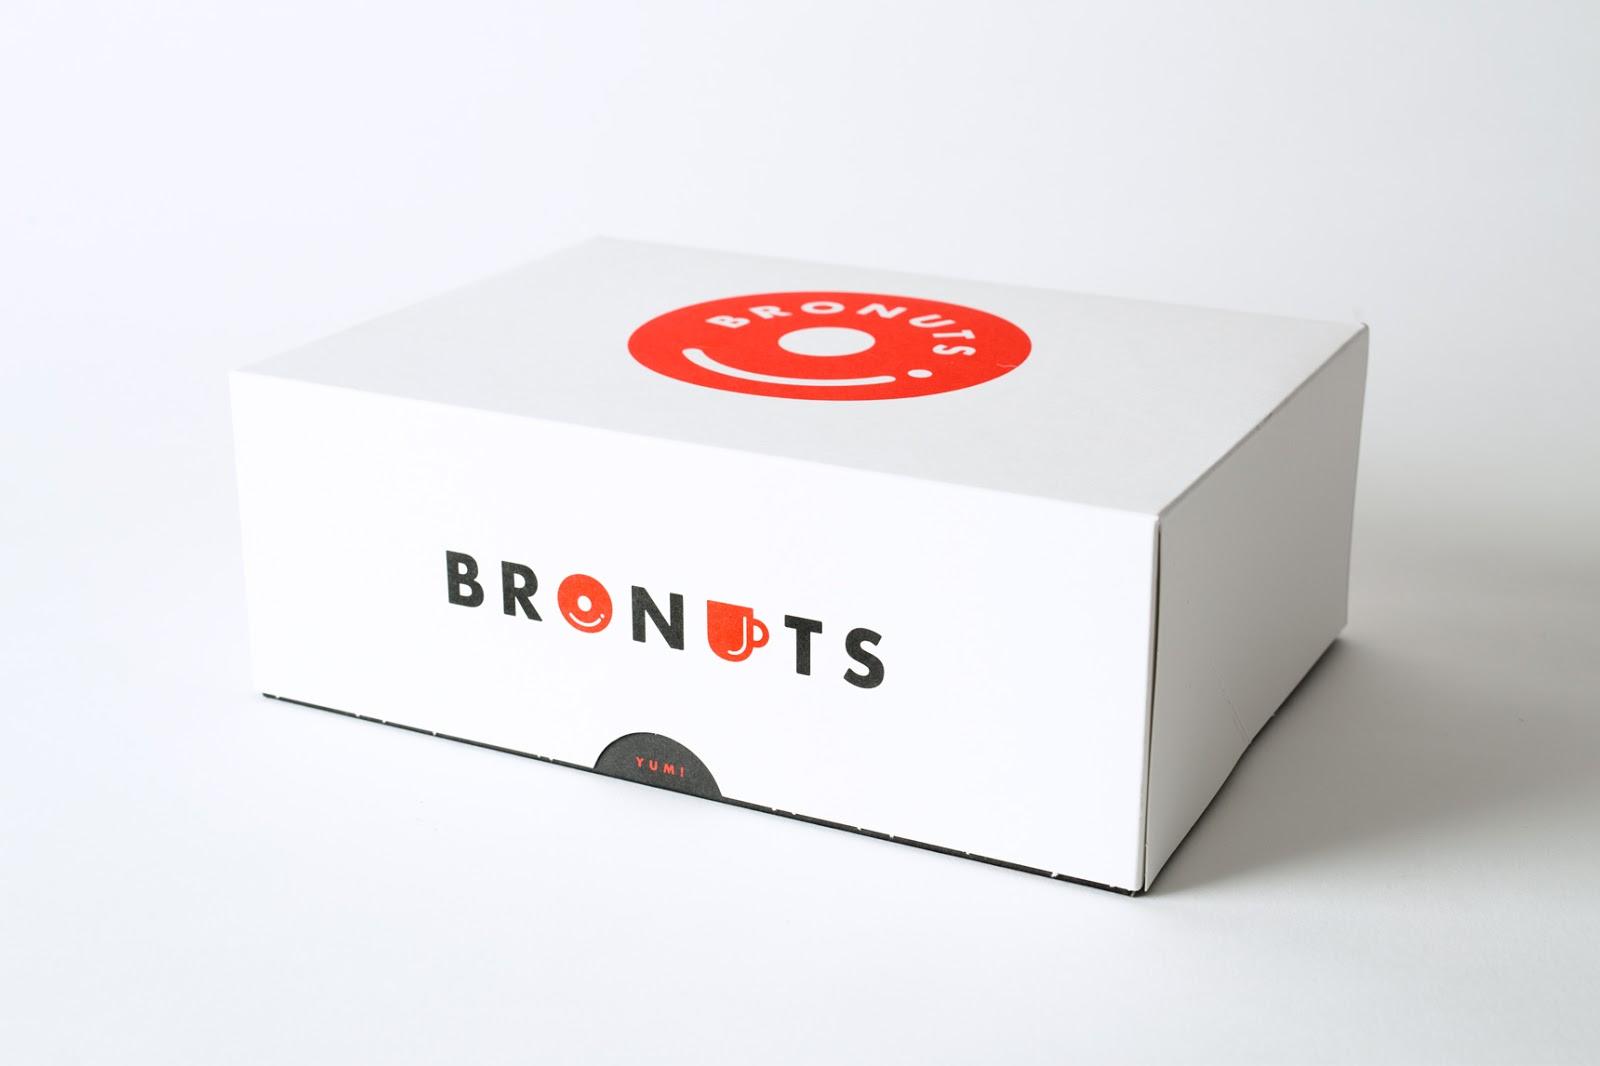 Bronuts-donuts-3